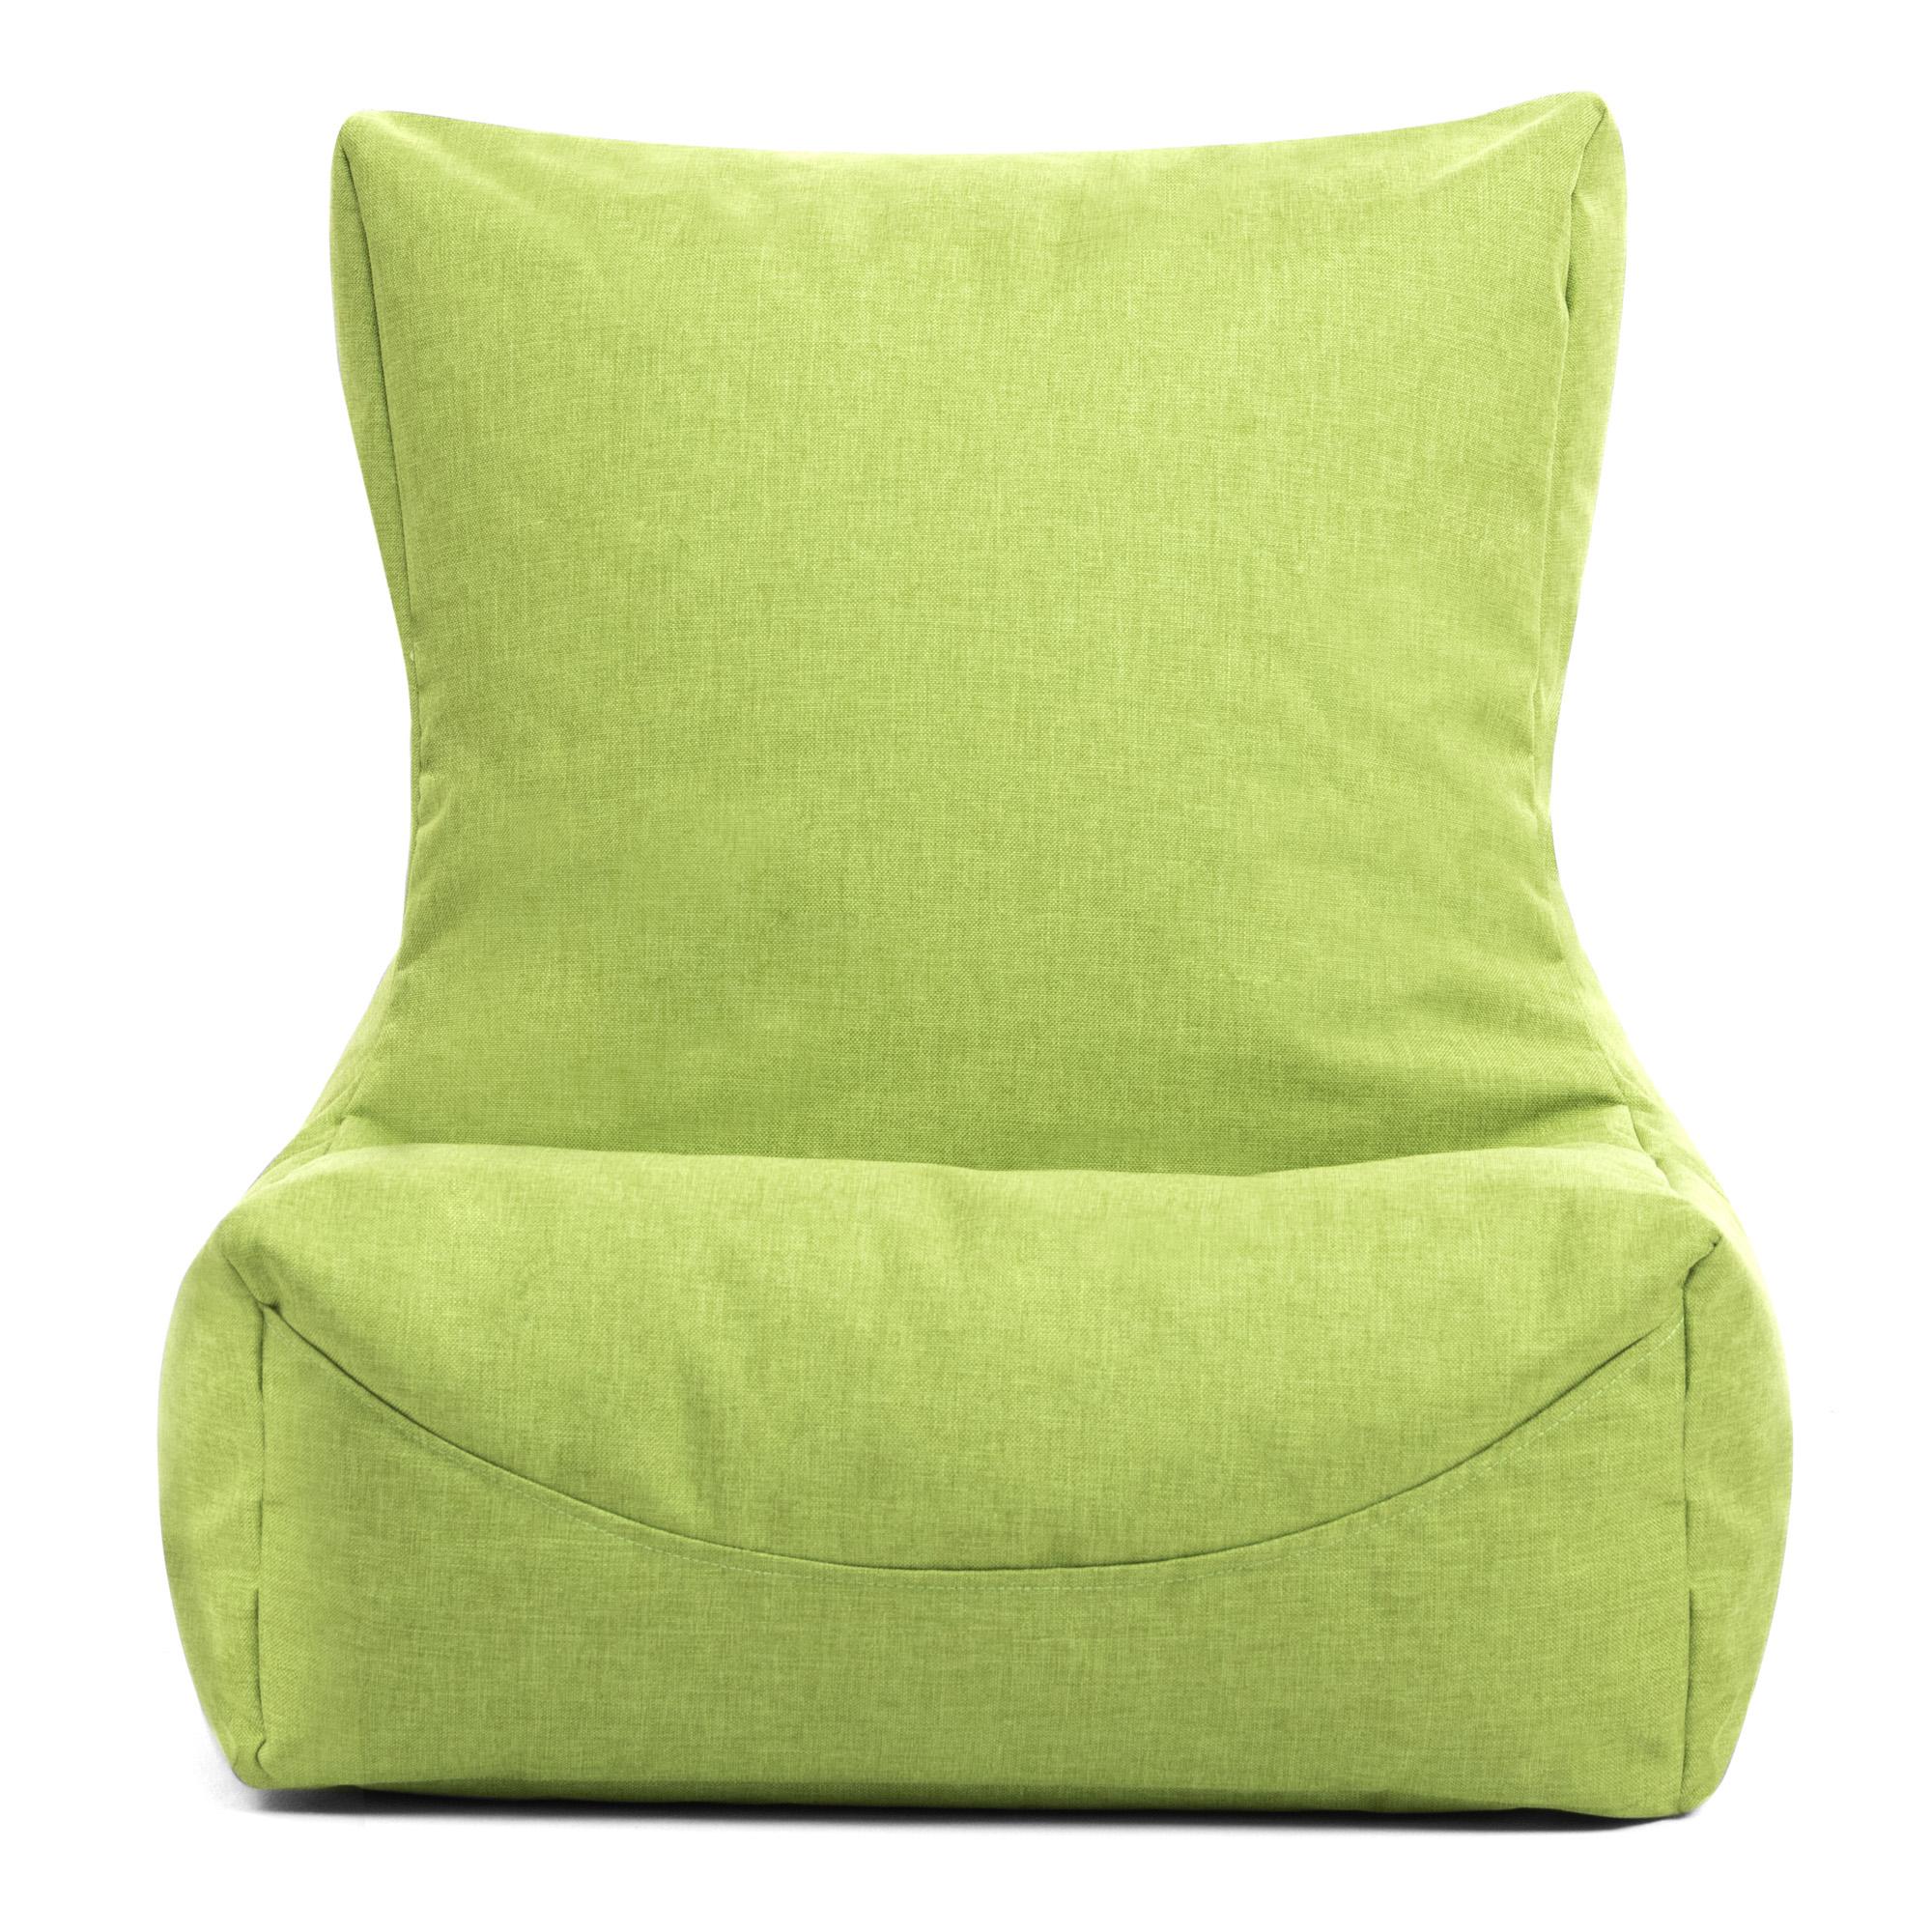 Eden-PRI-Smile-Chair-Lime-1-300dpi